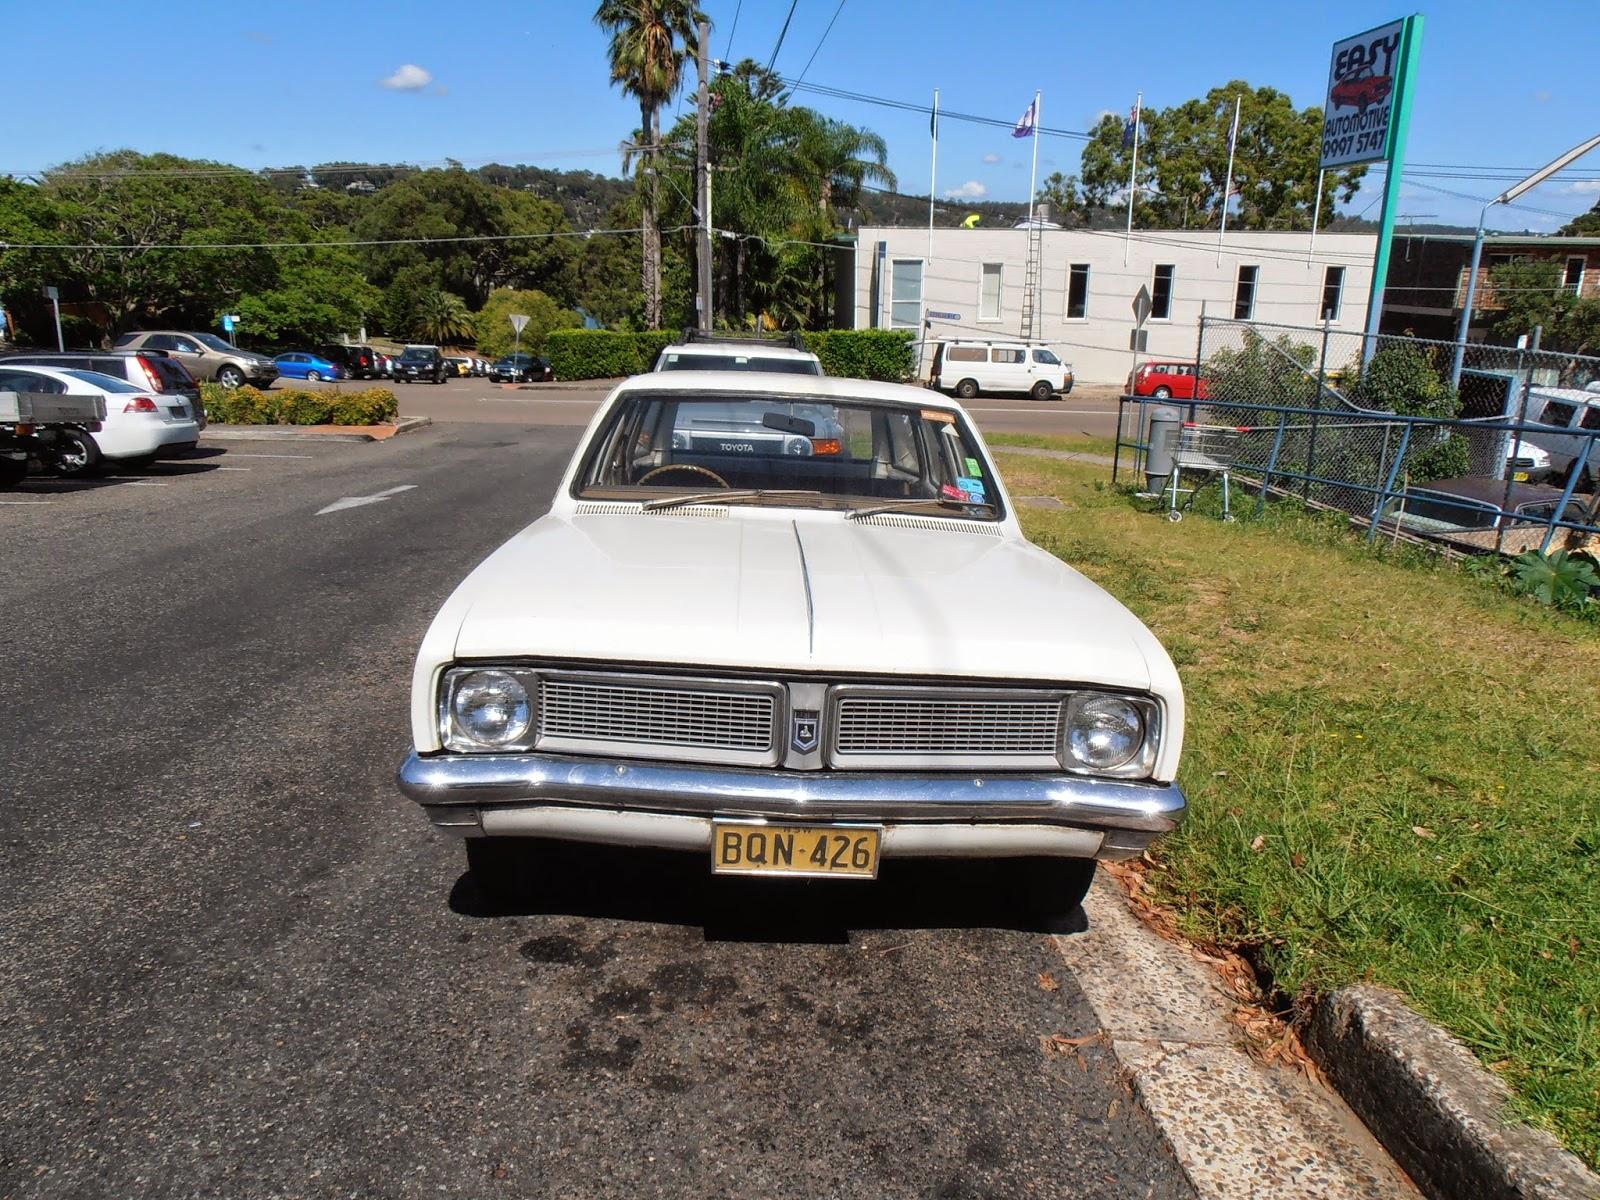 Aussie Old Parked Cars: 1971 Holden HG Belmont Wagon